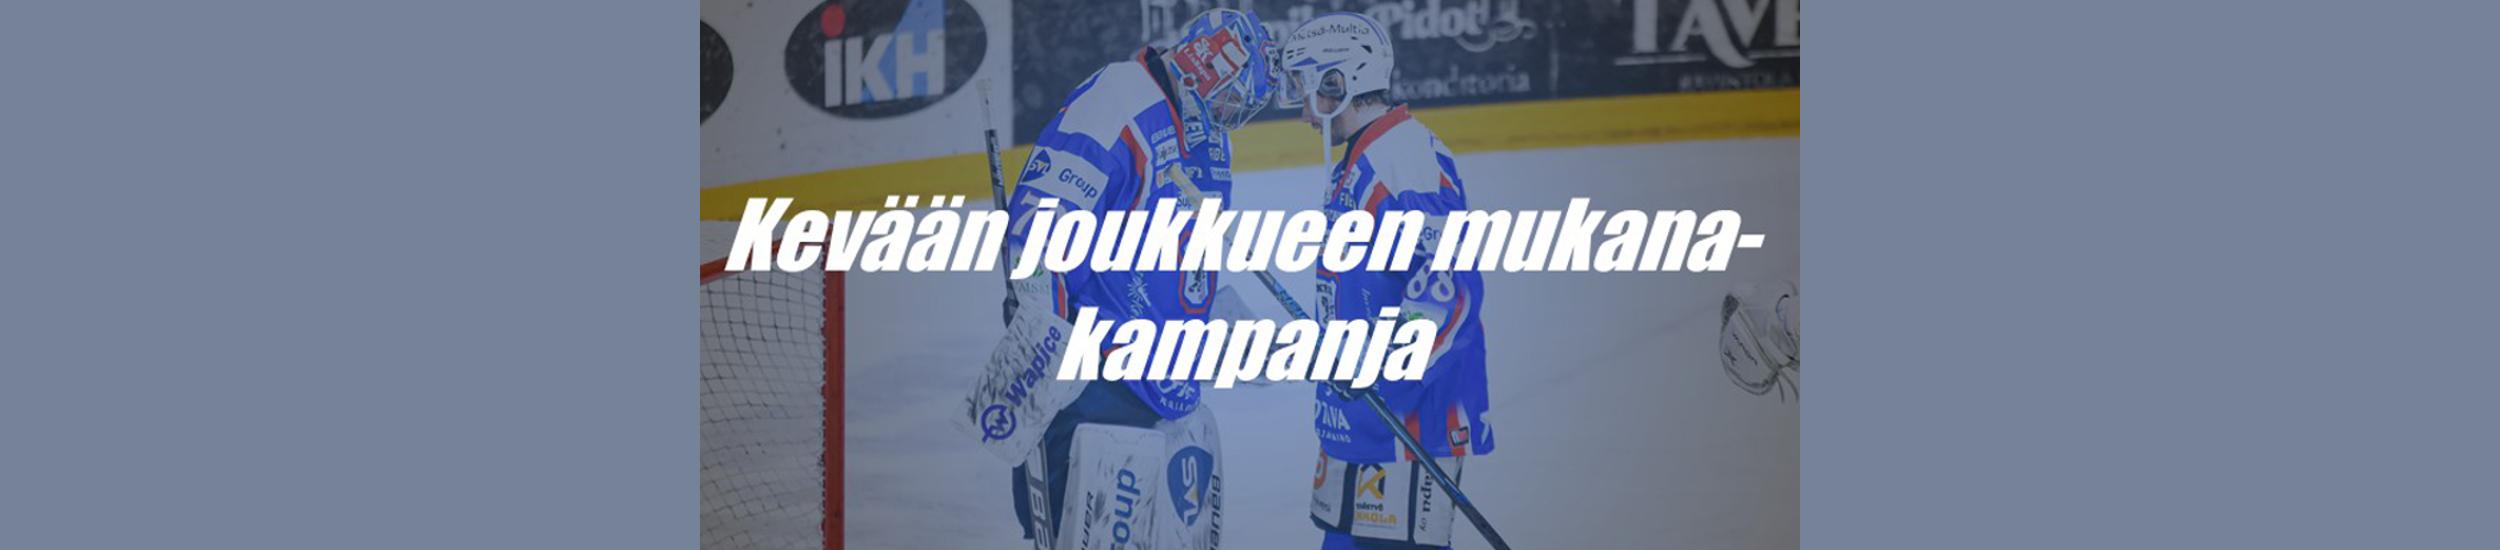 Joukkue-kampanja_KeuPaHT